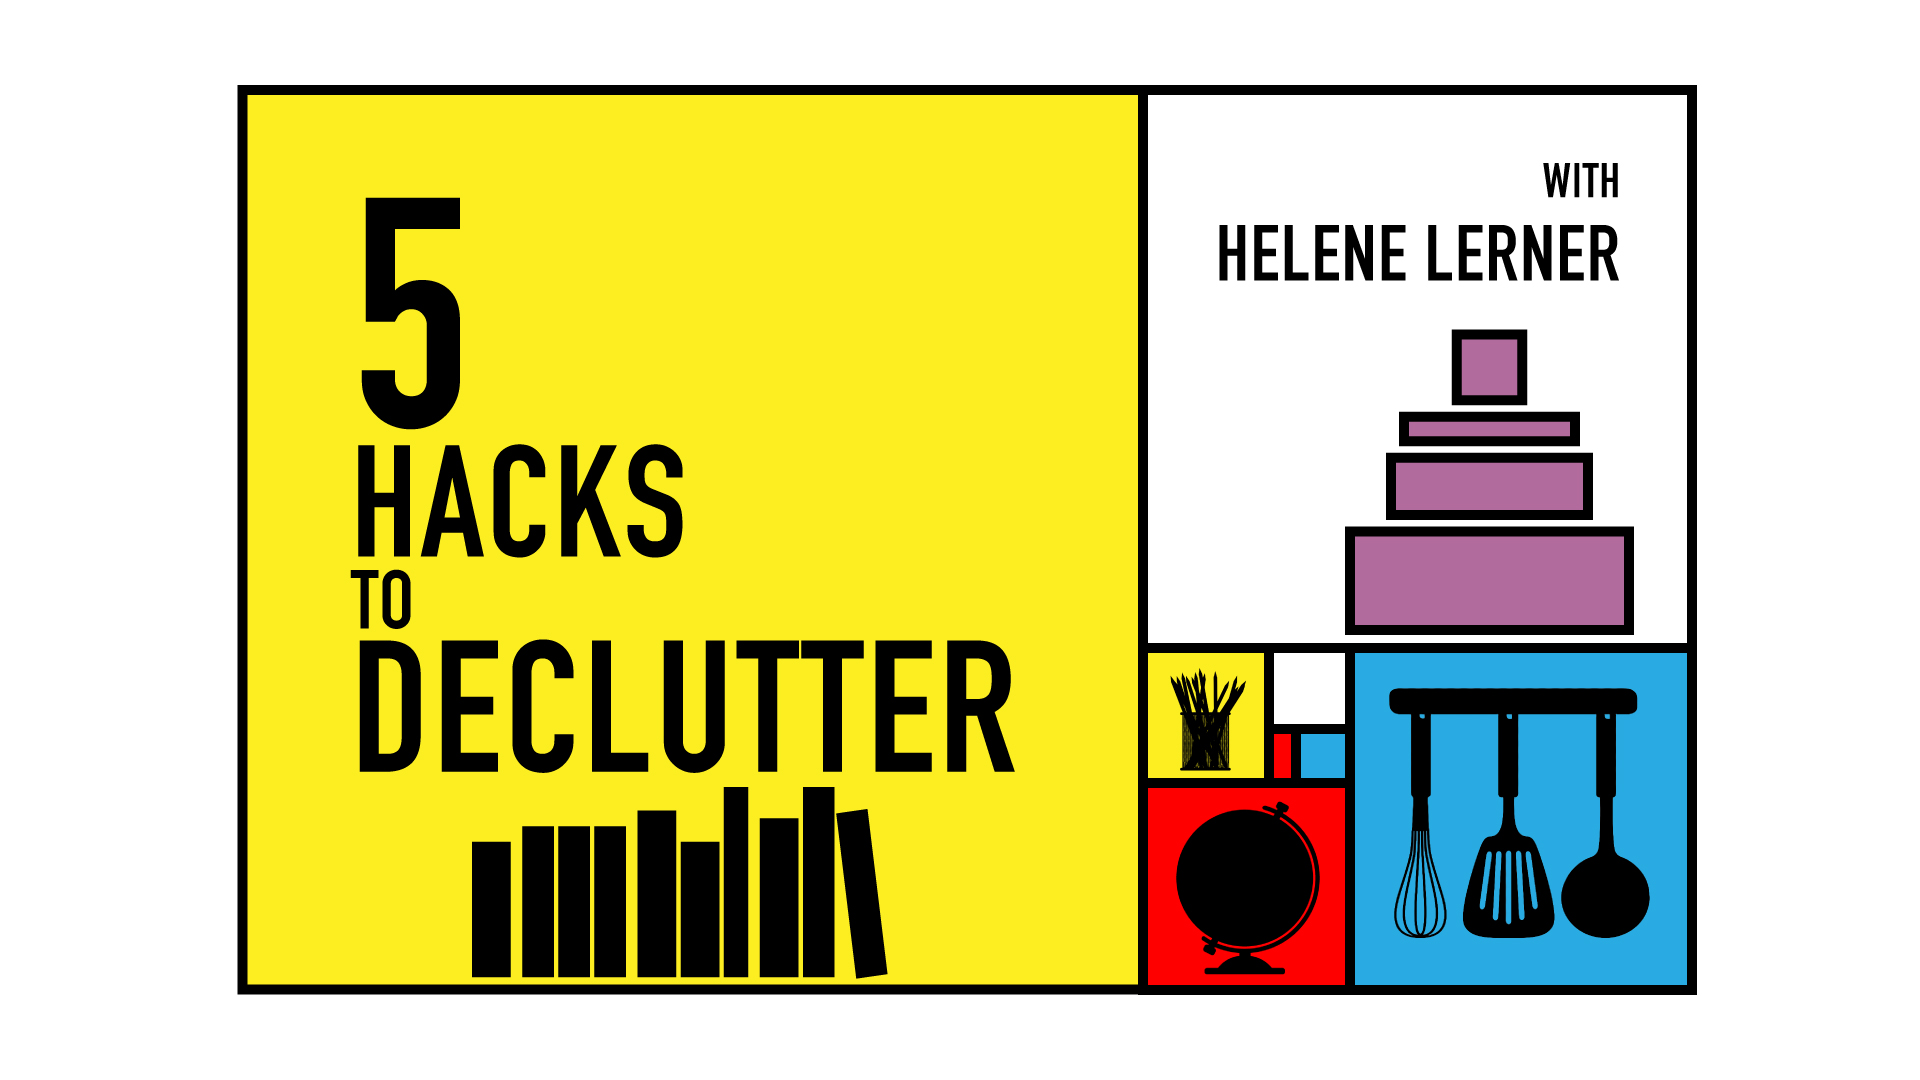 TestThumbnail_WomenWorking_5Hacks_Declutter4.jpg